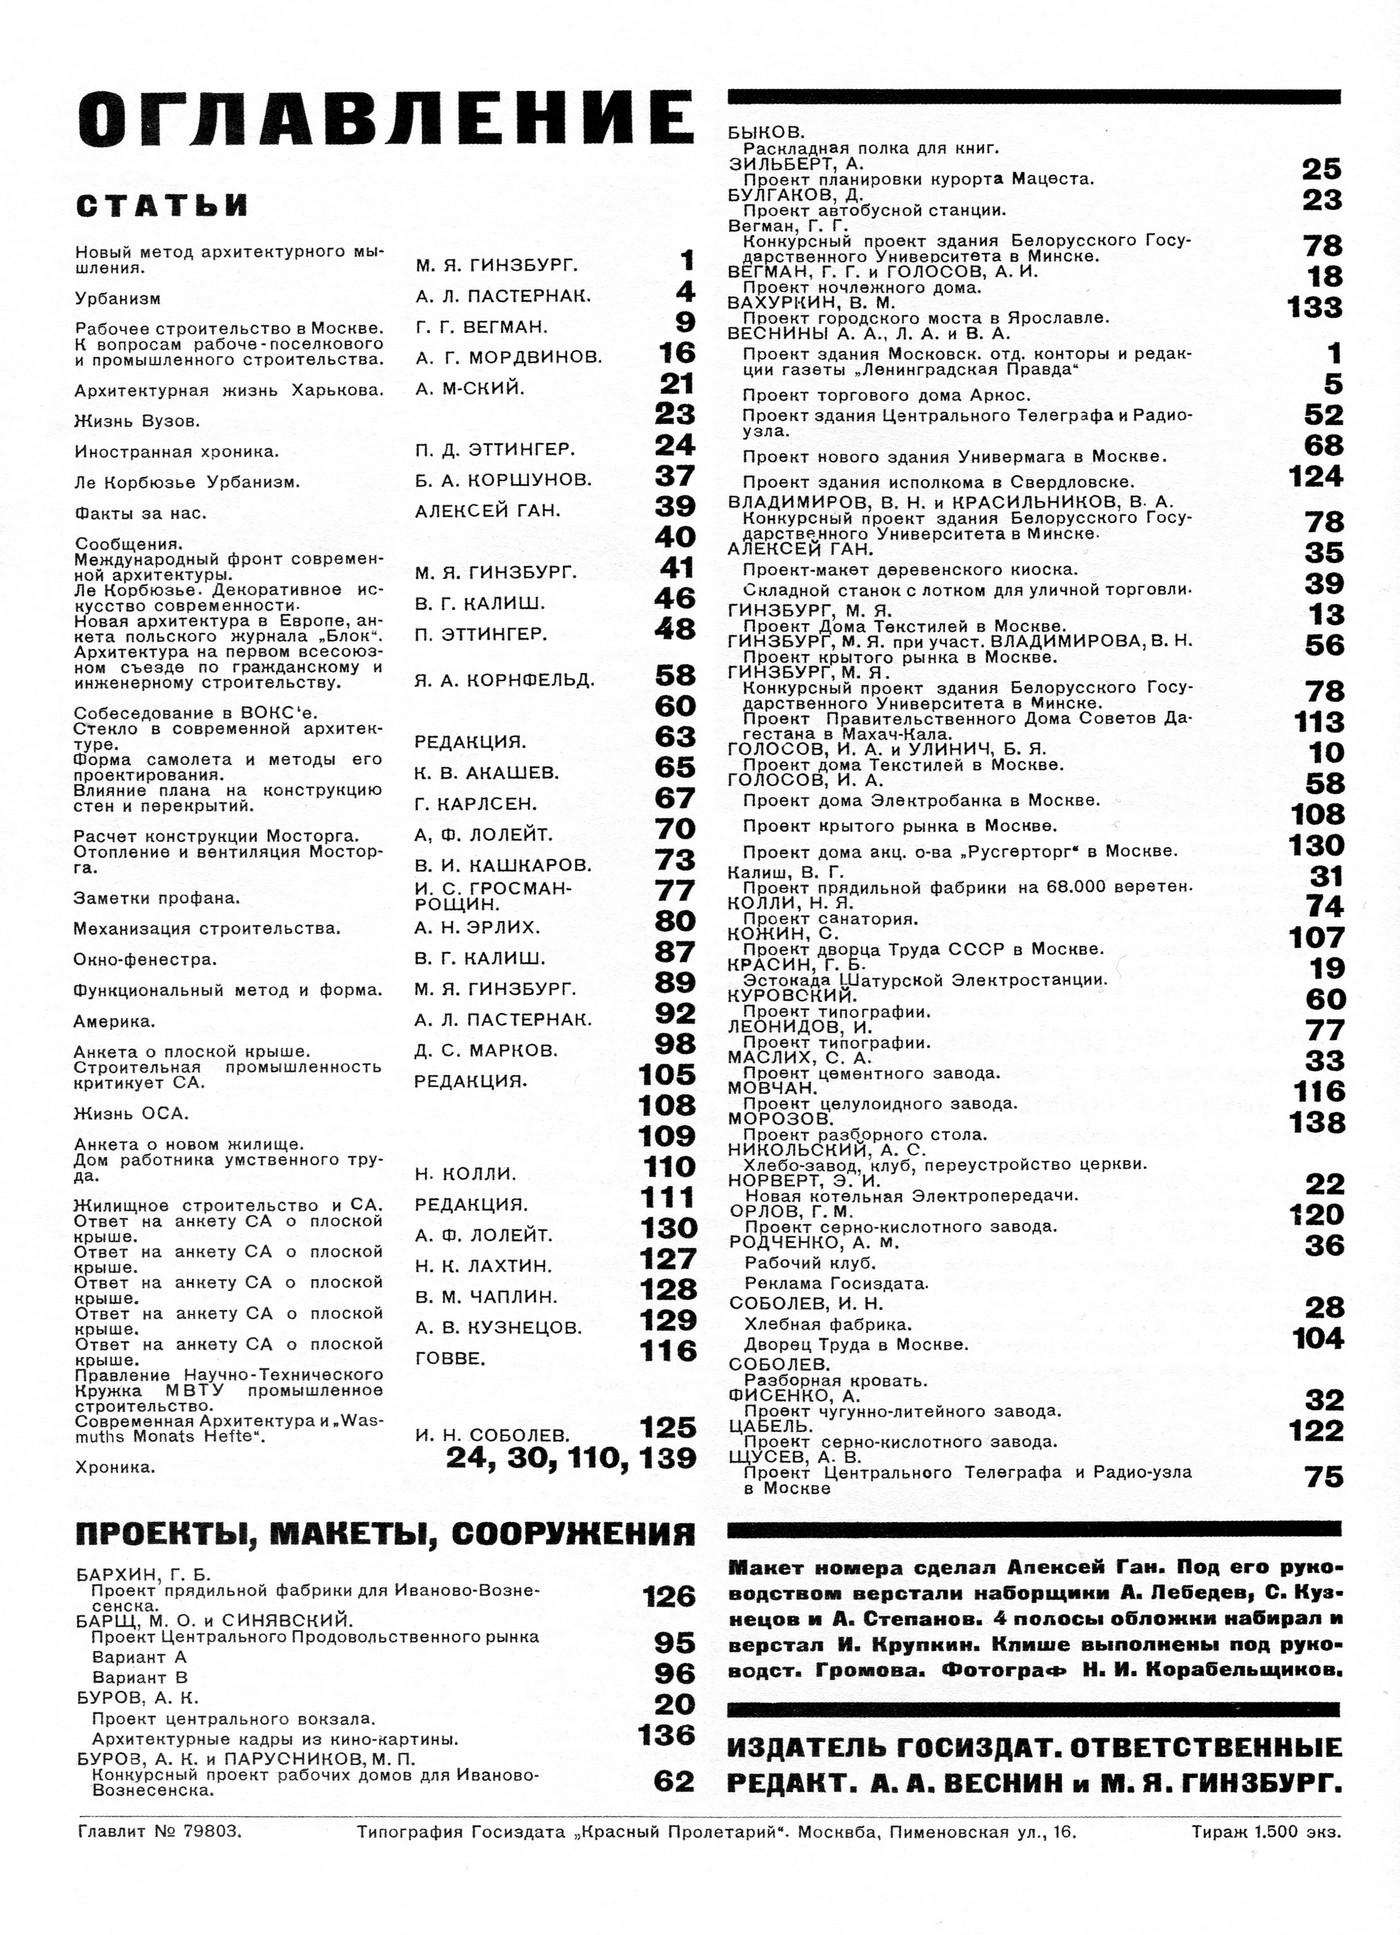 tehne.com-sa-1926-5-6-1400-0034